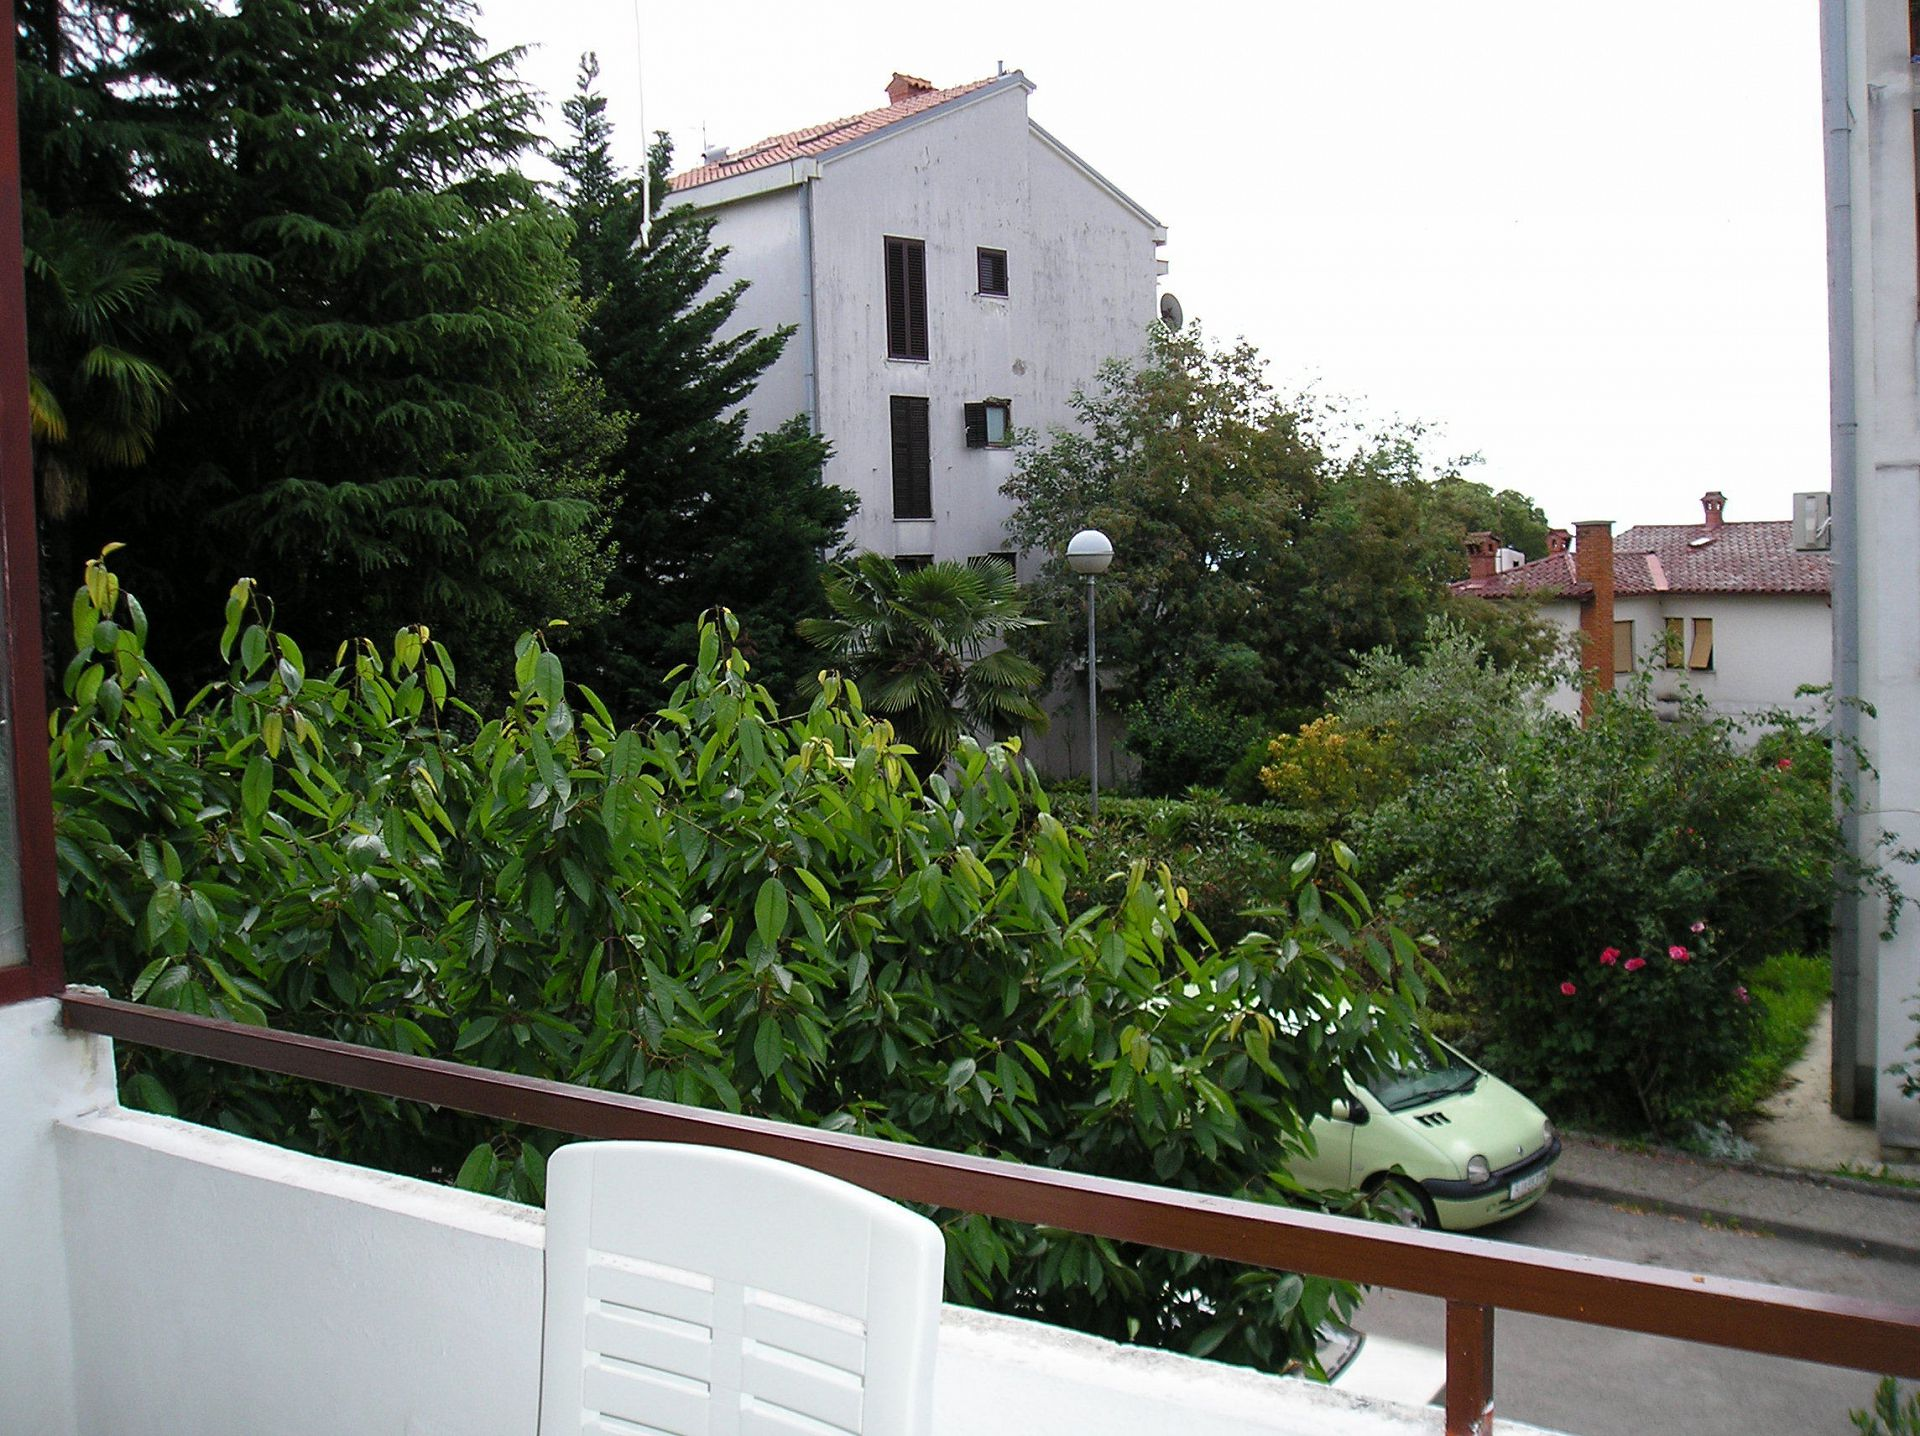 5751 - Lovran - Apartments Croatia - A1(2+2): terrace view